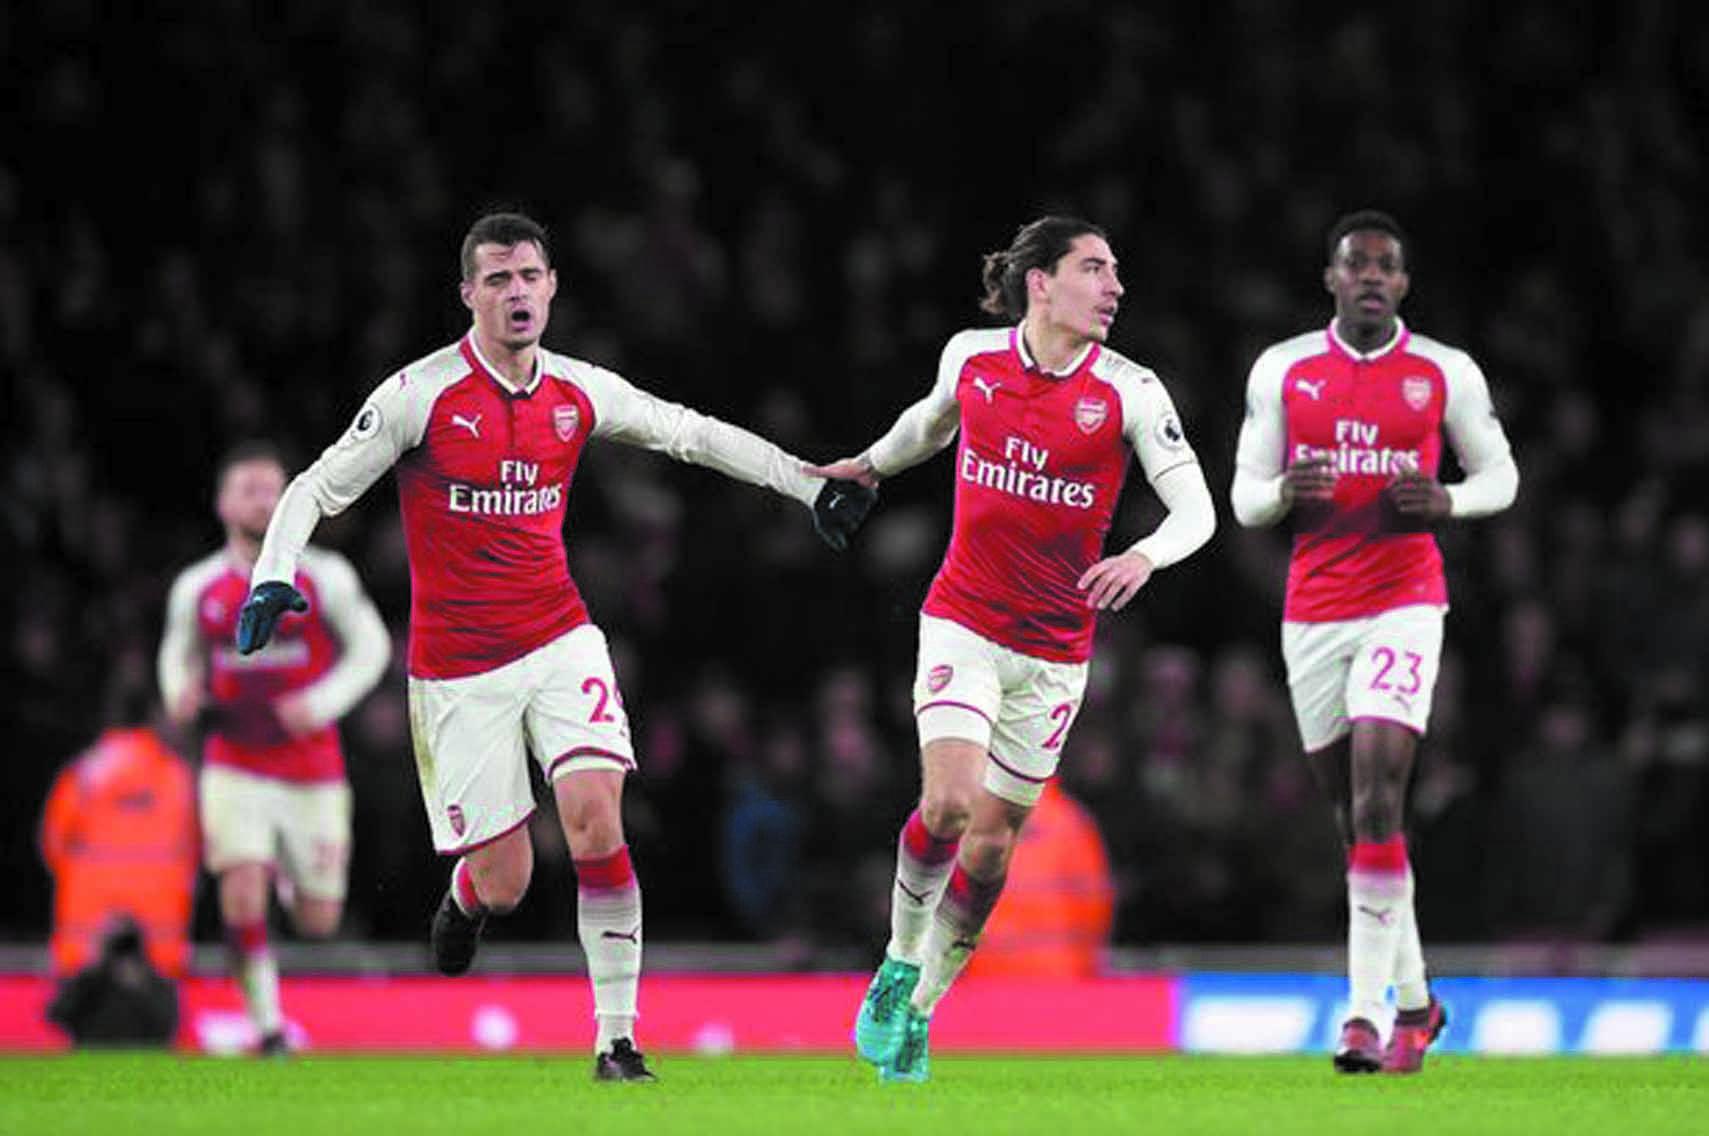 Arsenal voit la C1 s'éloigner